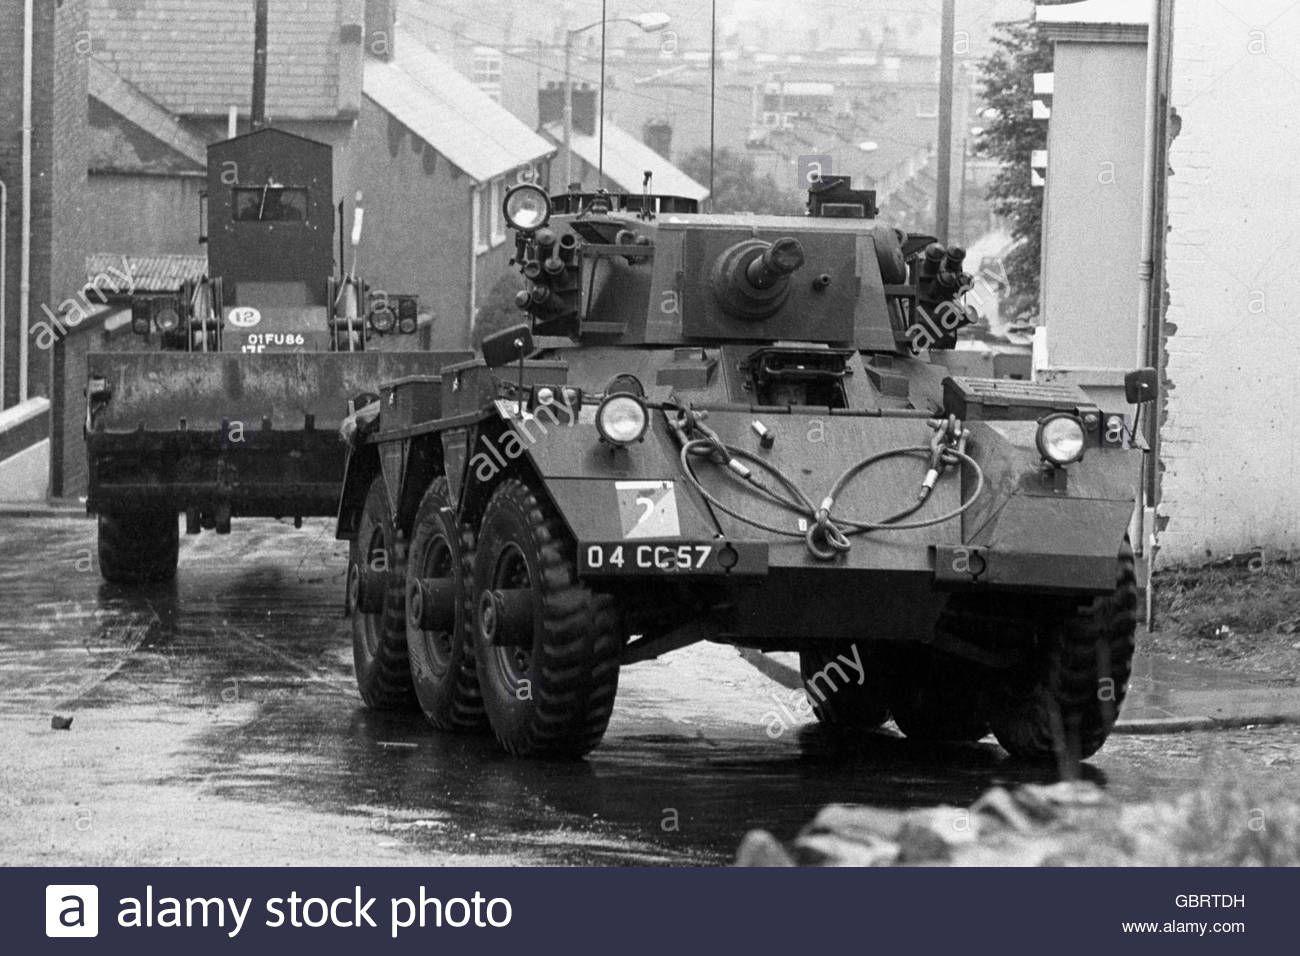 806b274060 Northern Ireland - The Troubles - Operation Motorman - Londonderry Stock  Photo